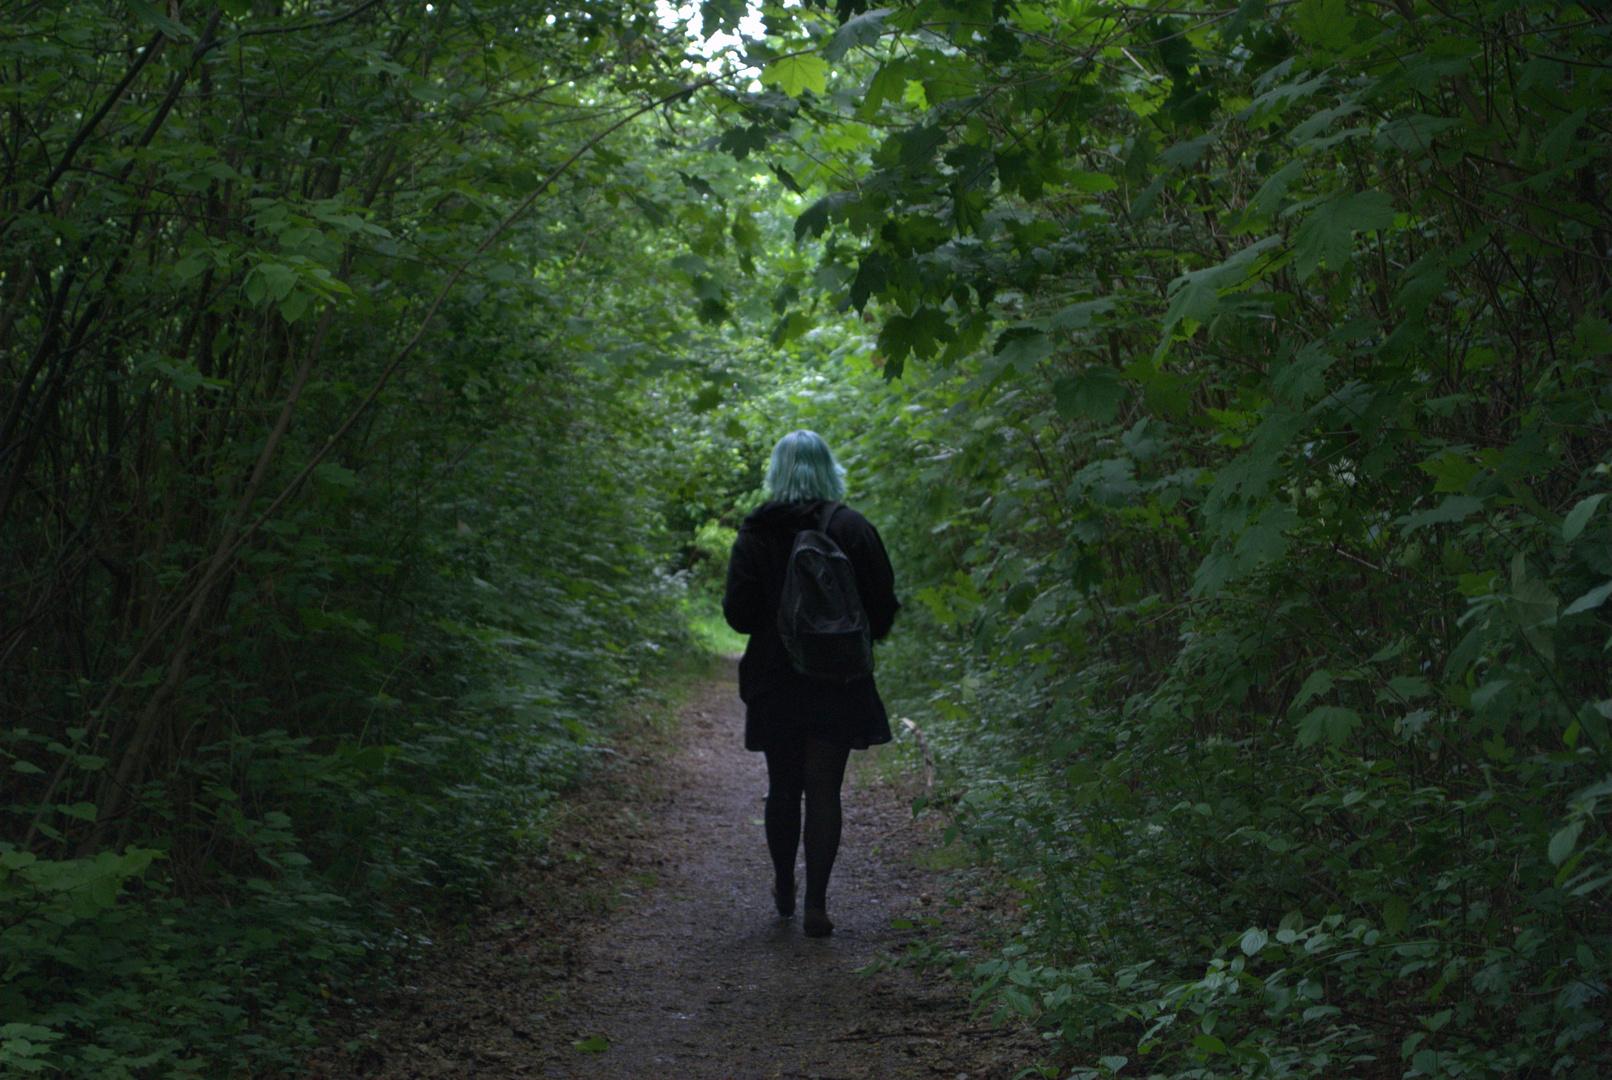 Spaziergänge